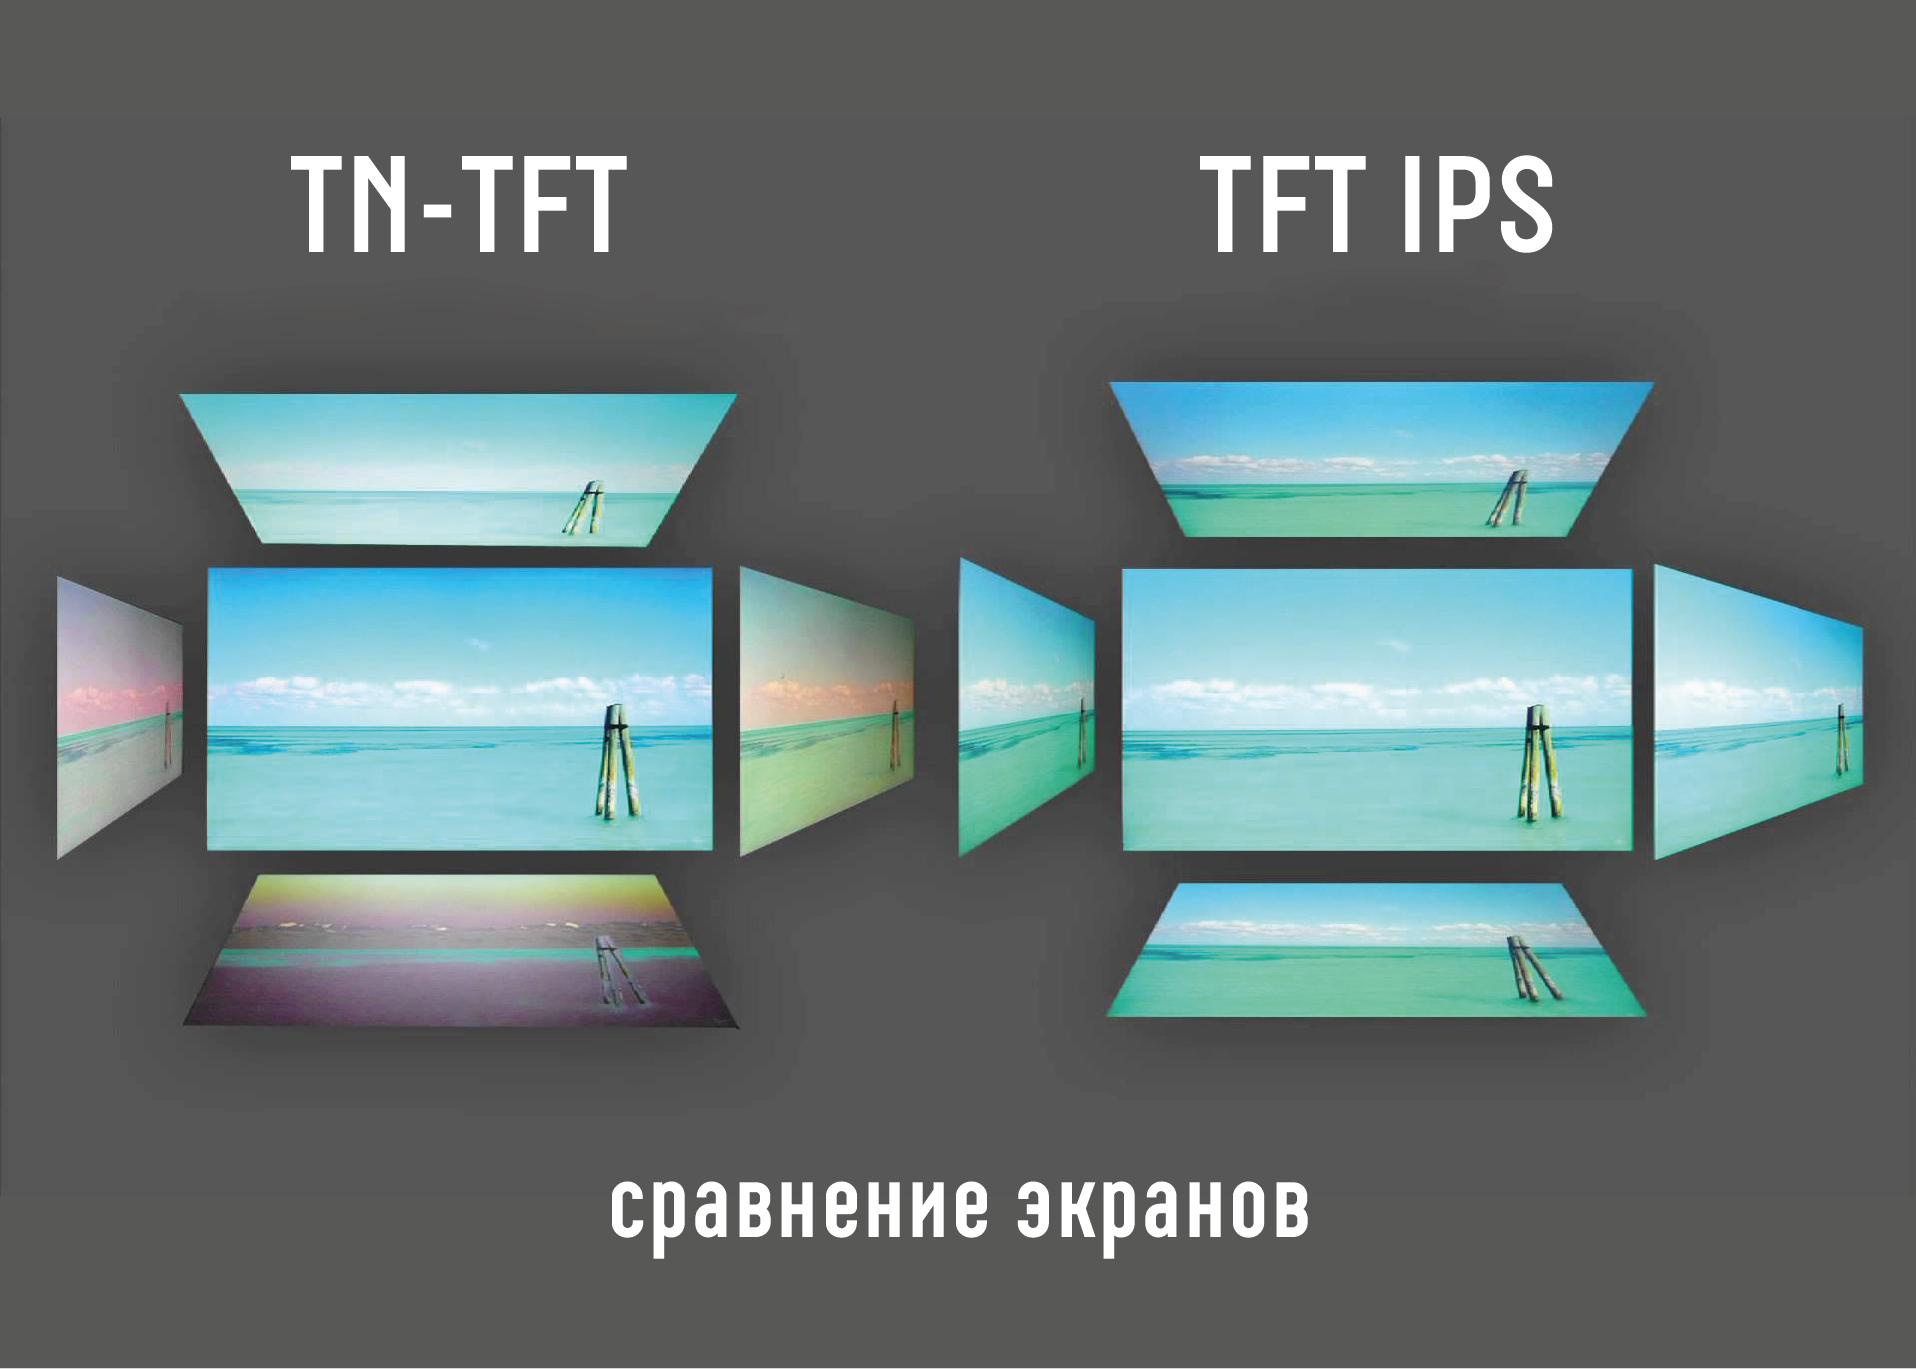 Всё про типы матрицы мониторов: tn, ips, pls, va, mva, oled